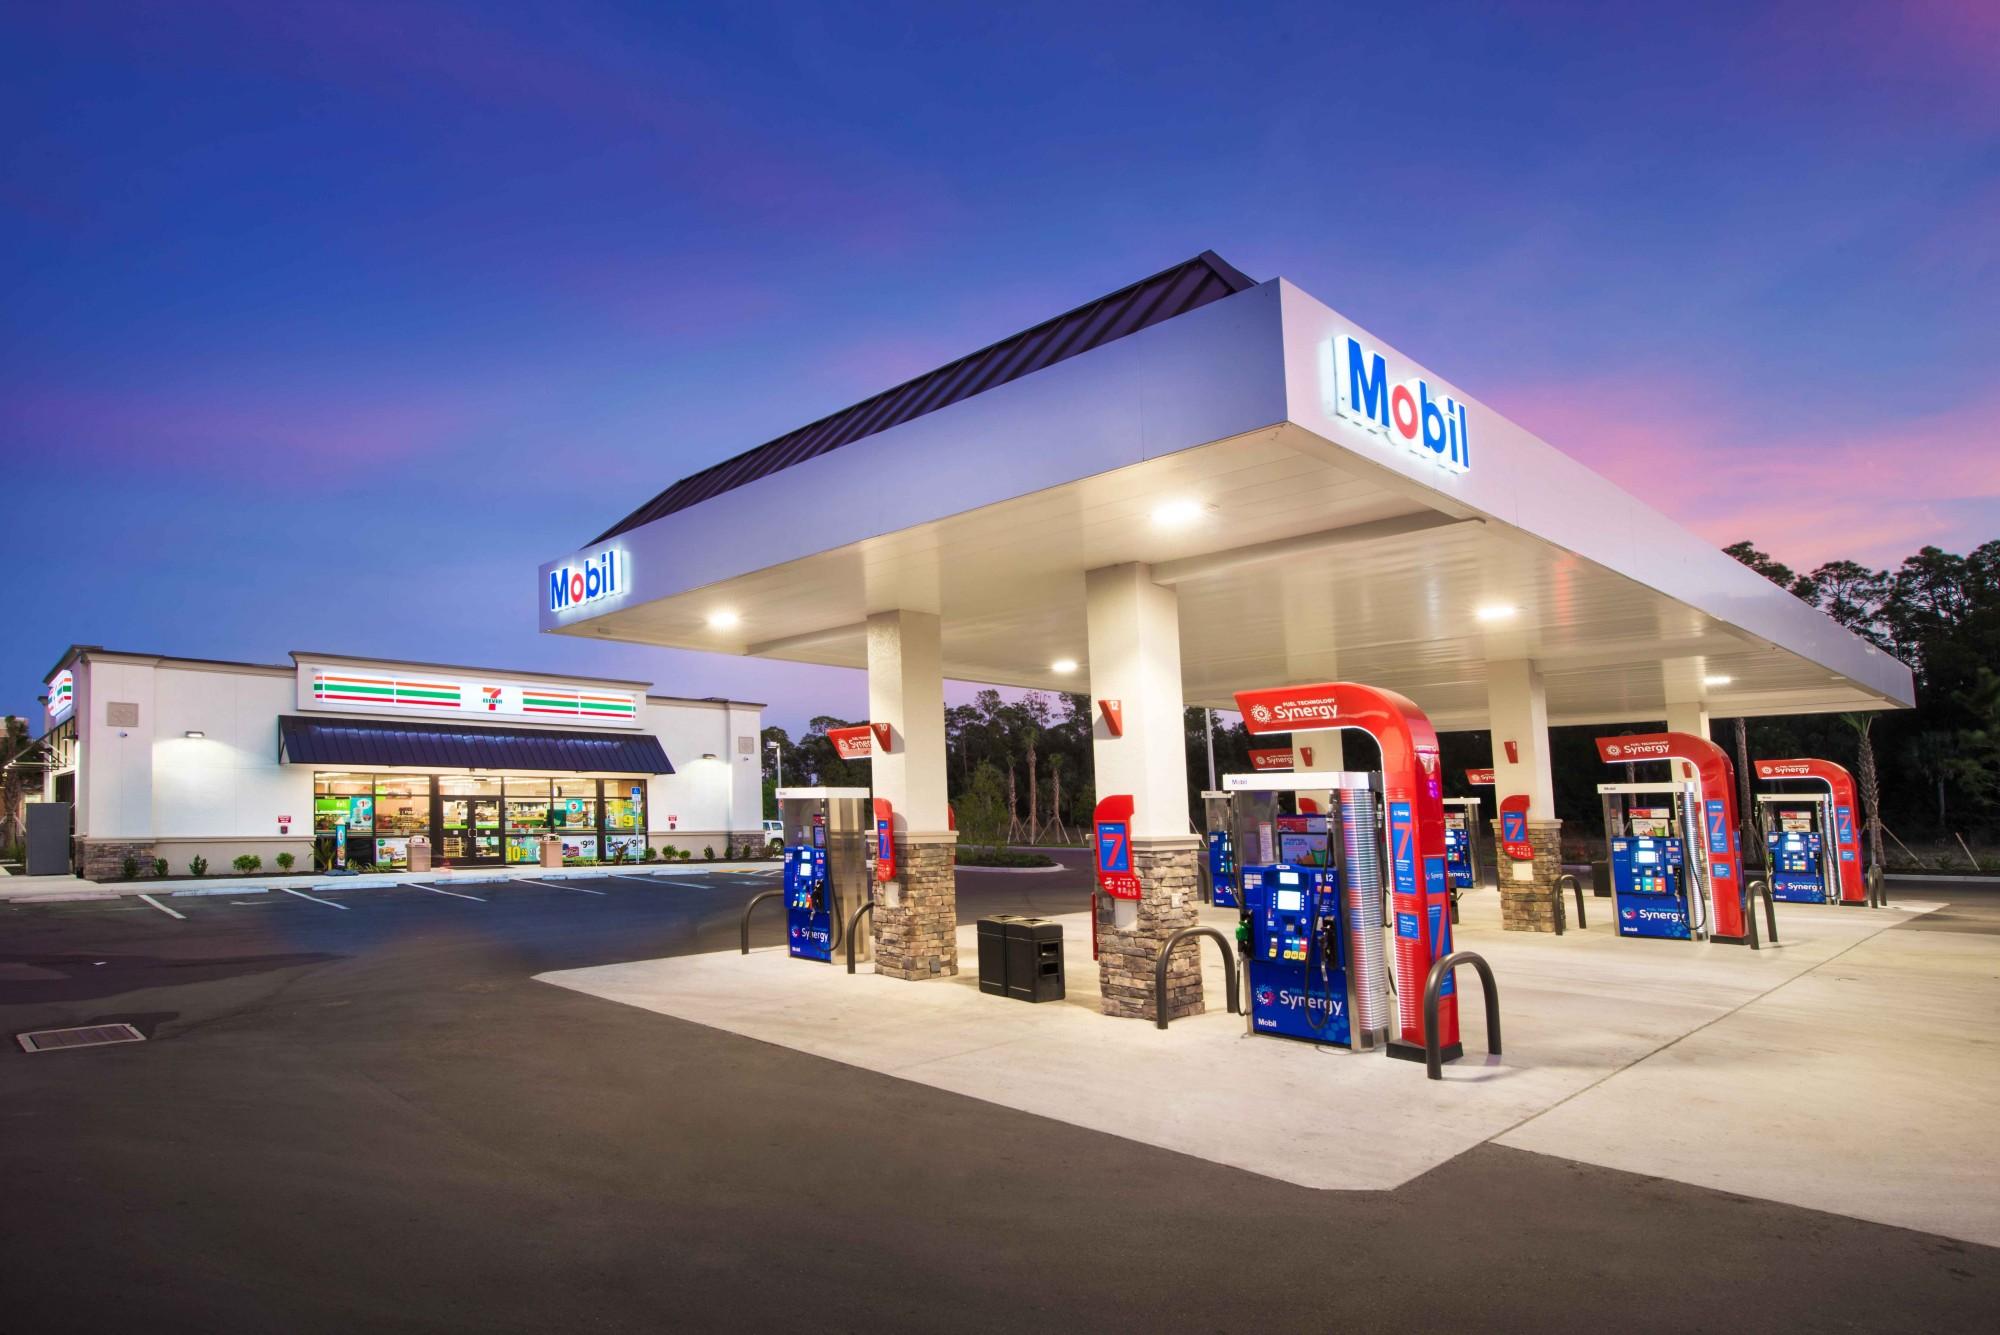 Creighton Construction Amp Development Completes Nine 7 Eleven Locations In Florida